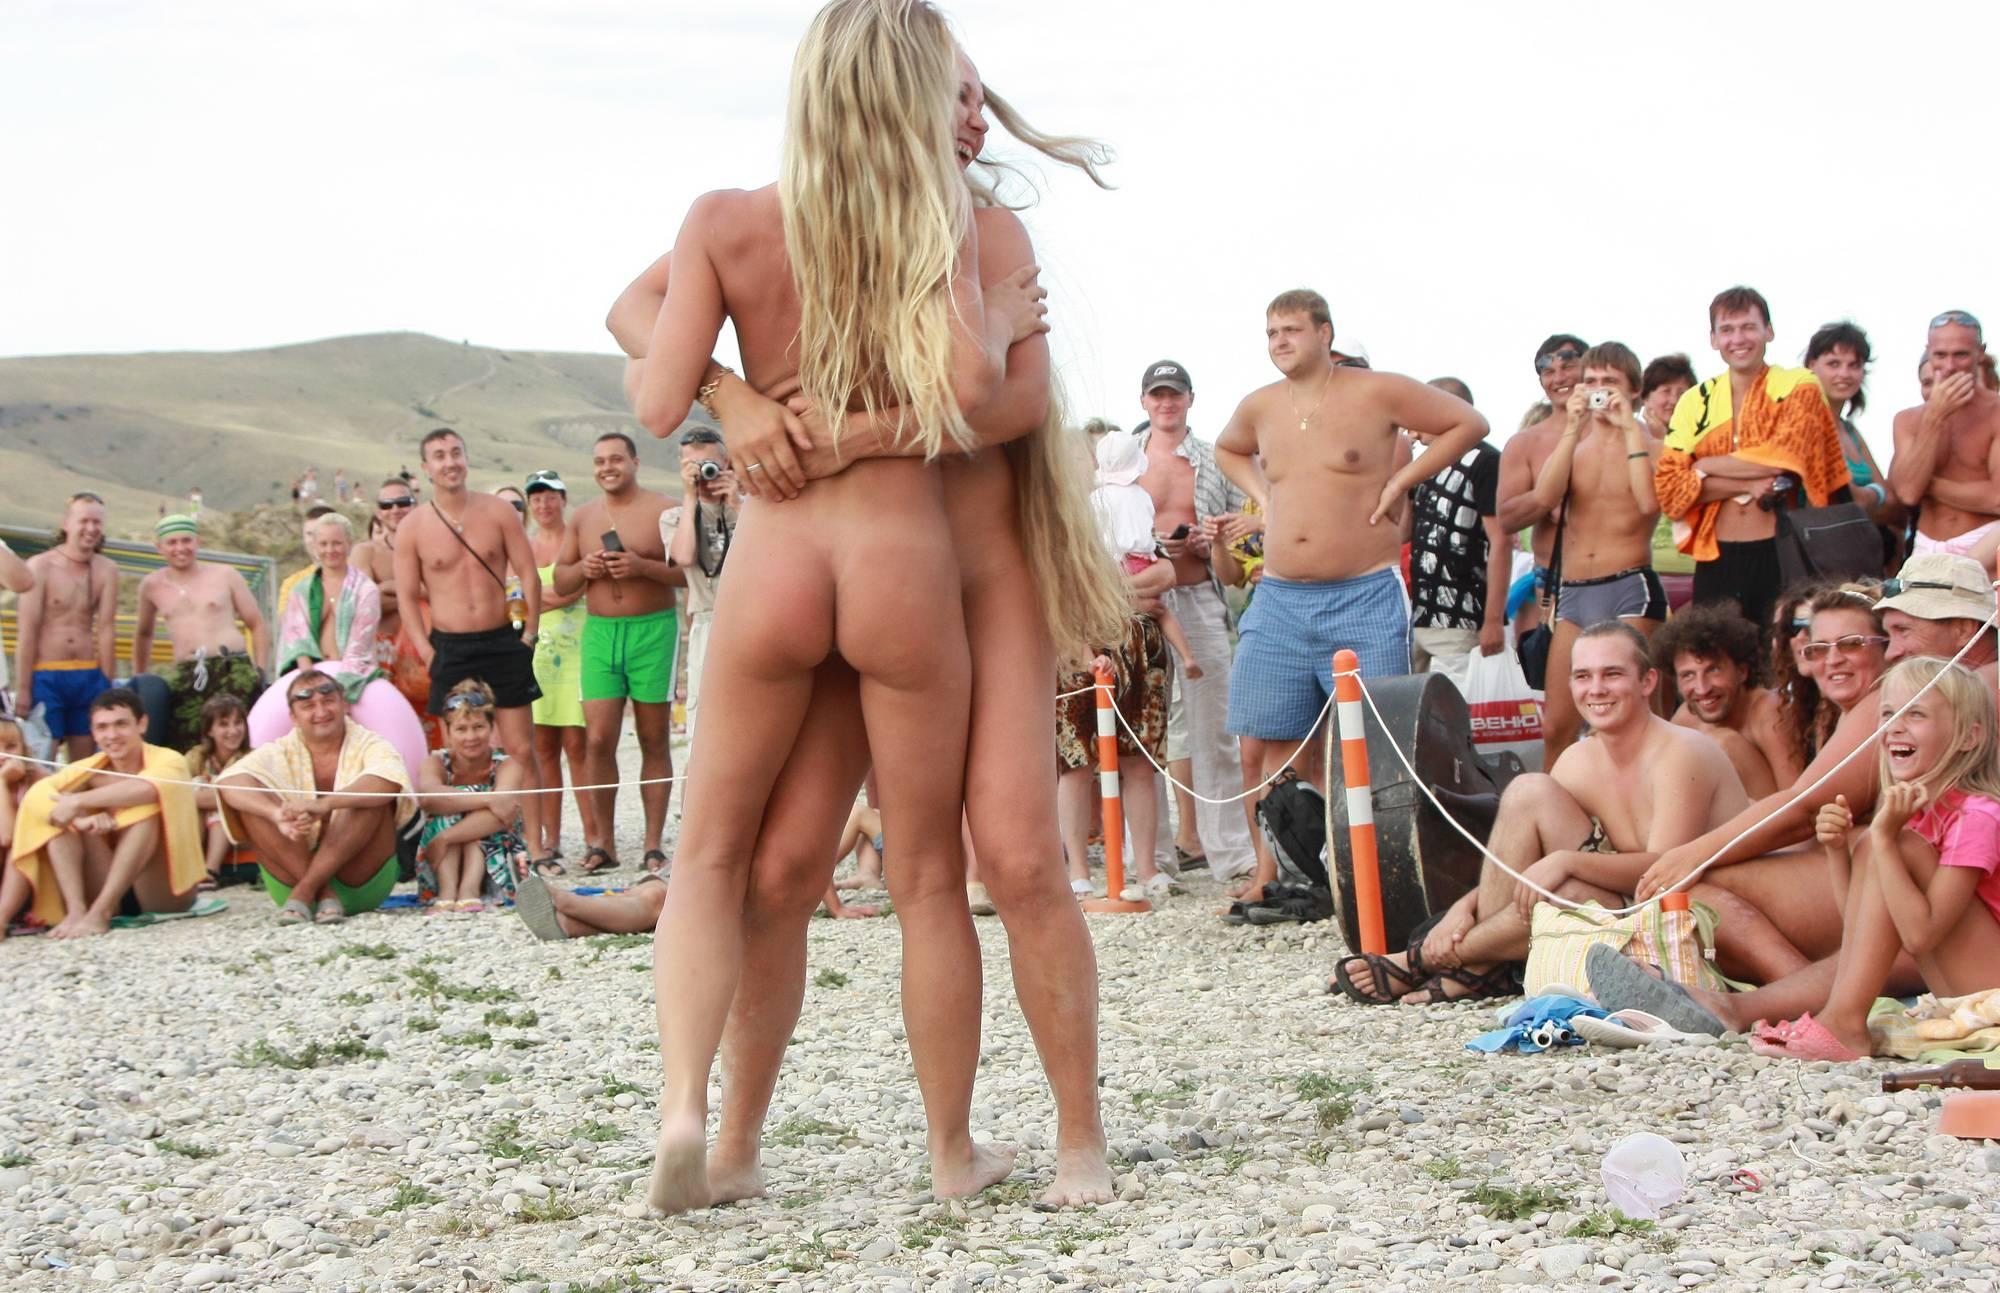 Nudist Photos Neptune Girl is Picked Up - 1